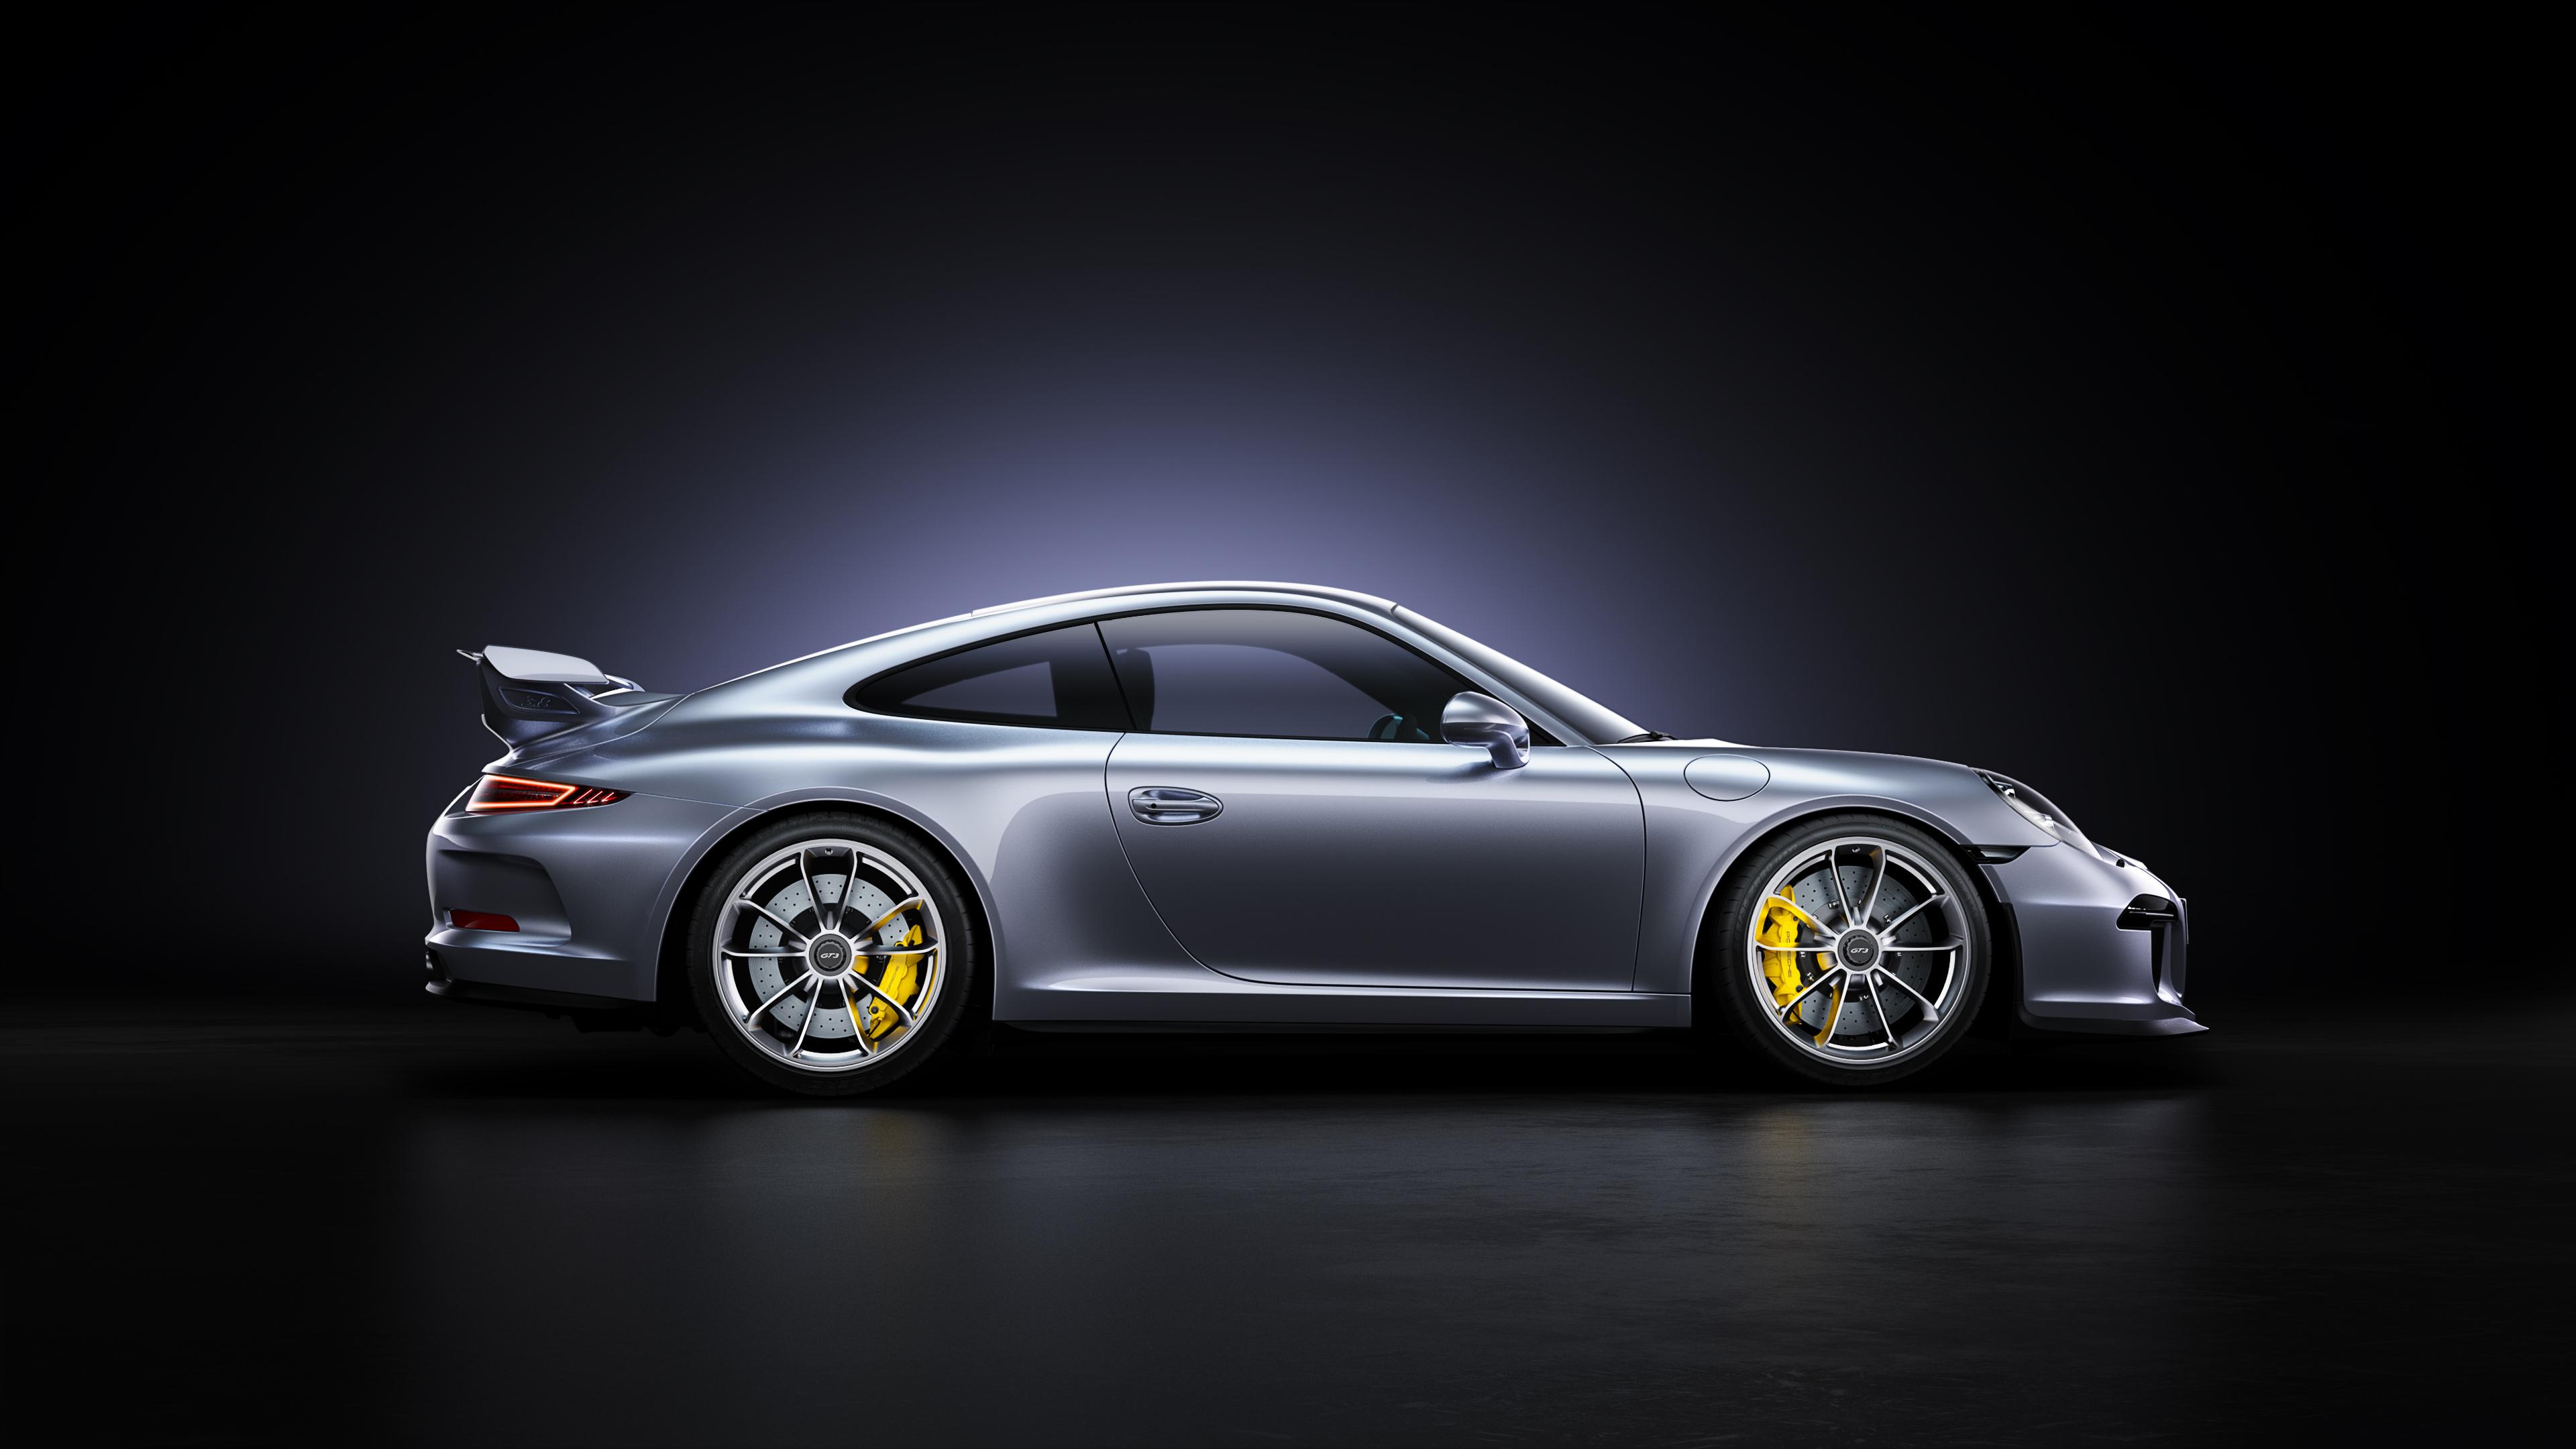 Porsche 911 GT3 4k, HD Cars, 4k Wallpapers, Images